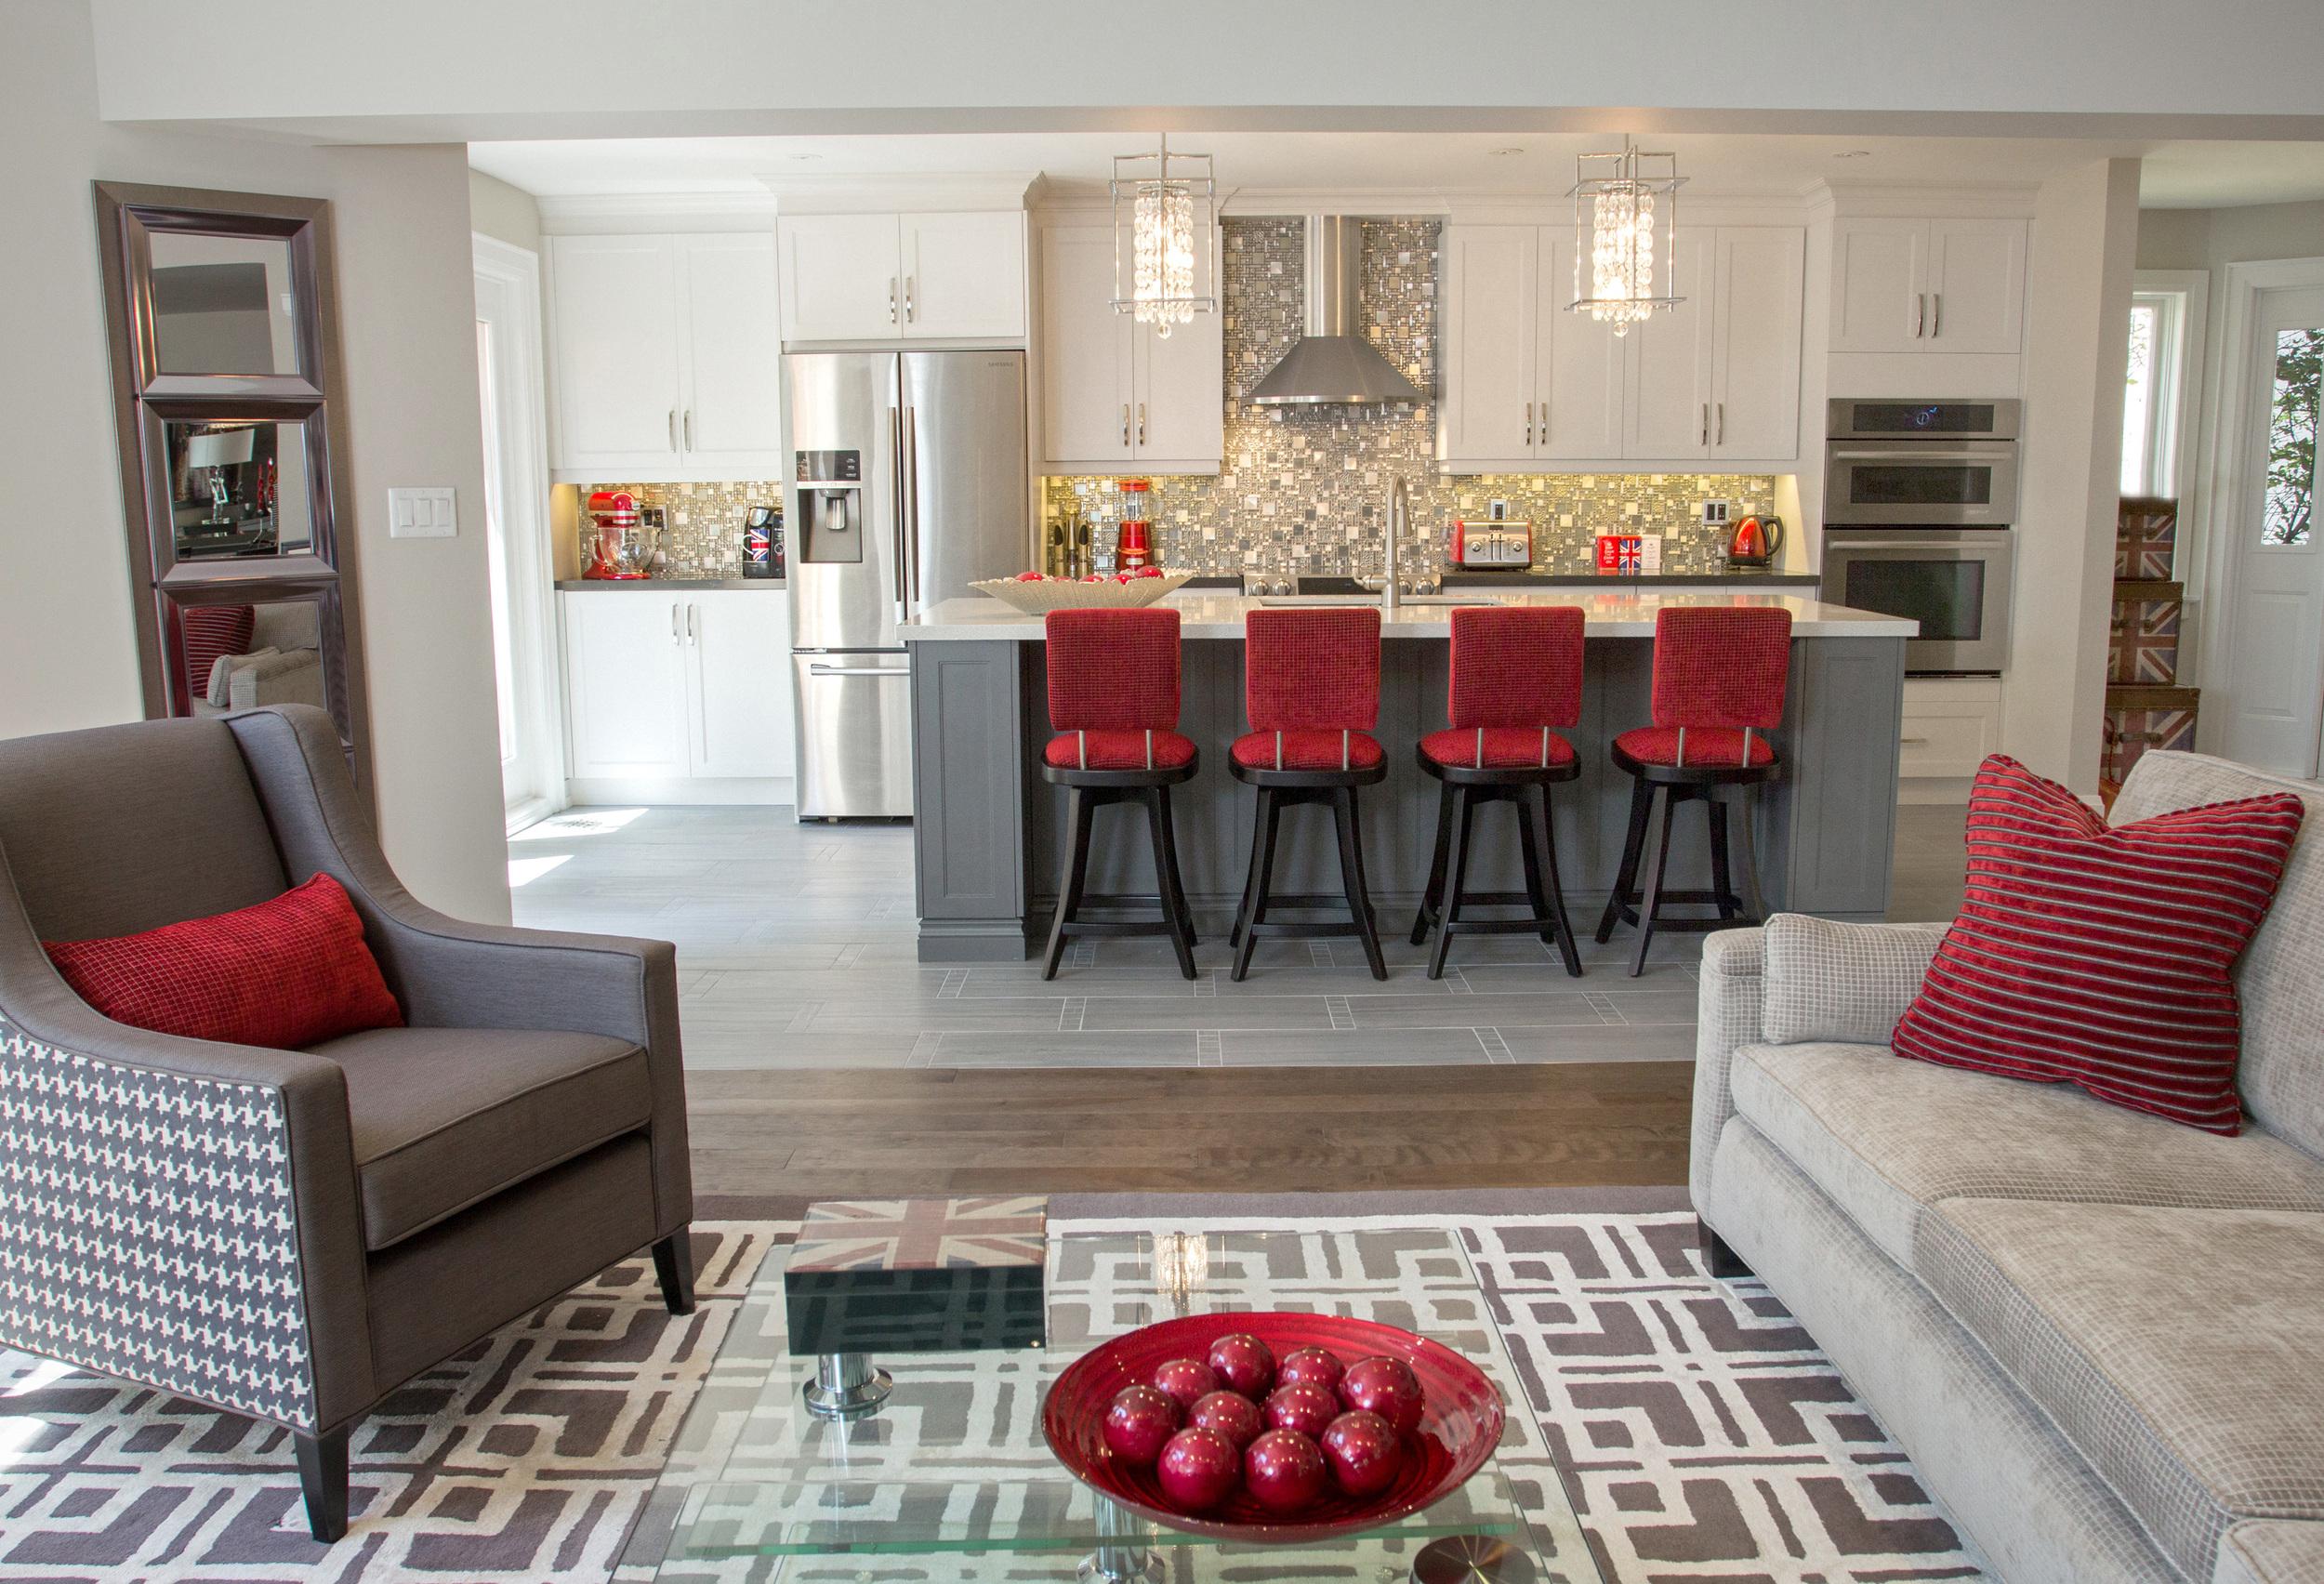 Chic Decor Interior Decorating And Design